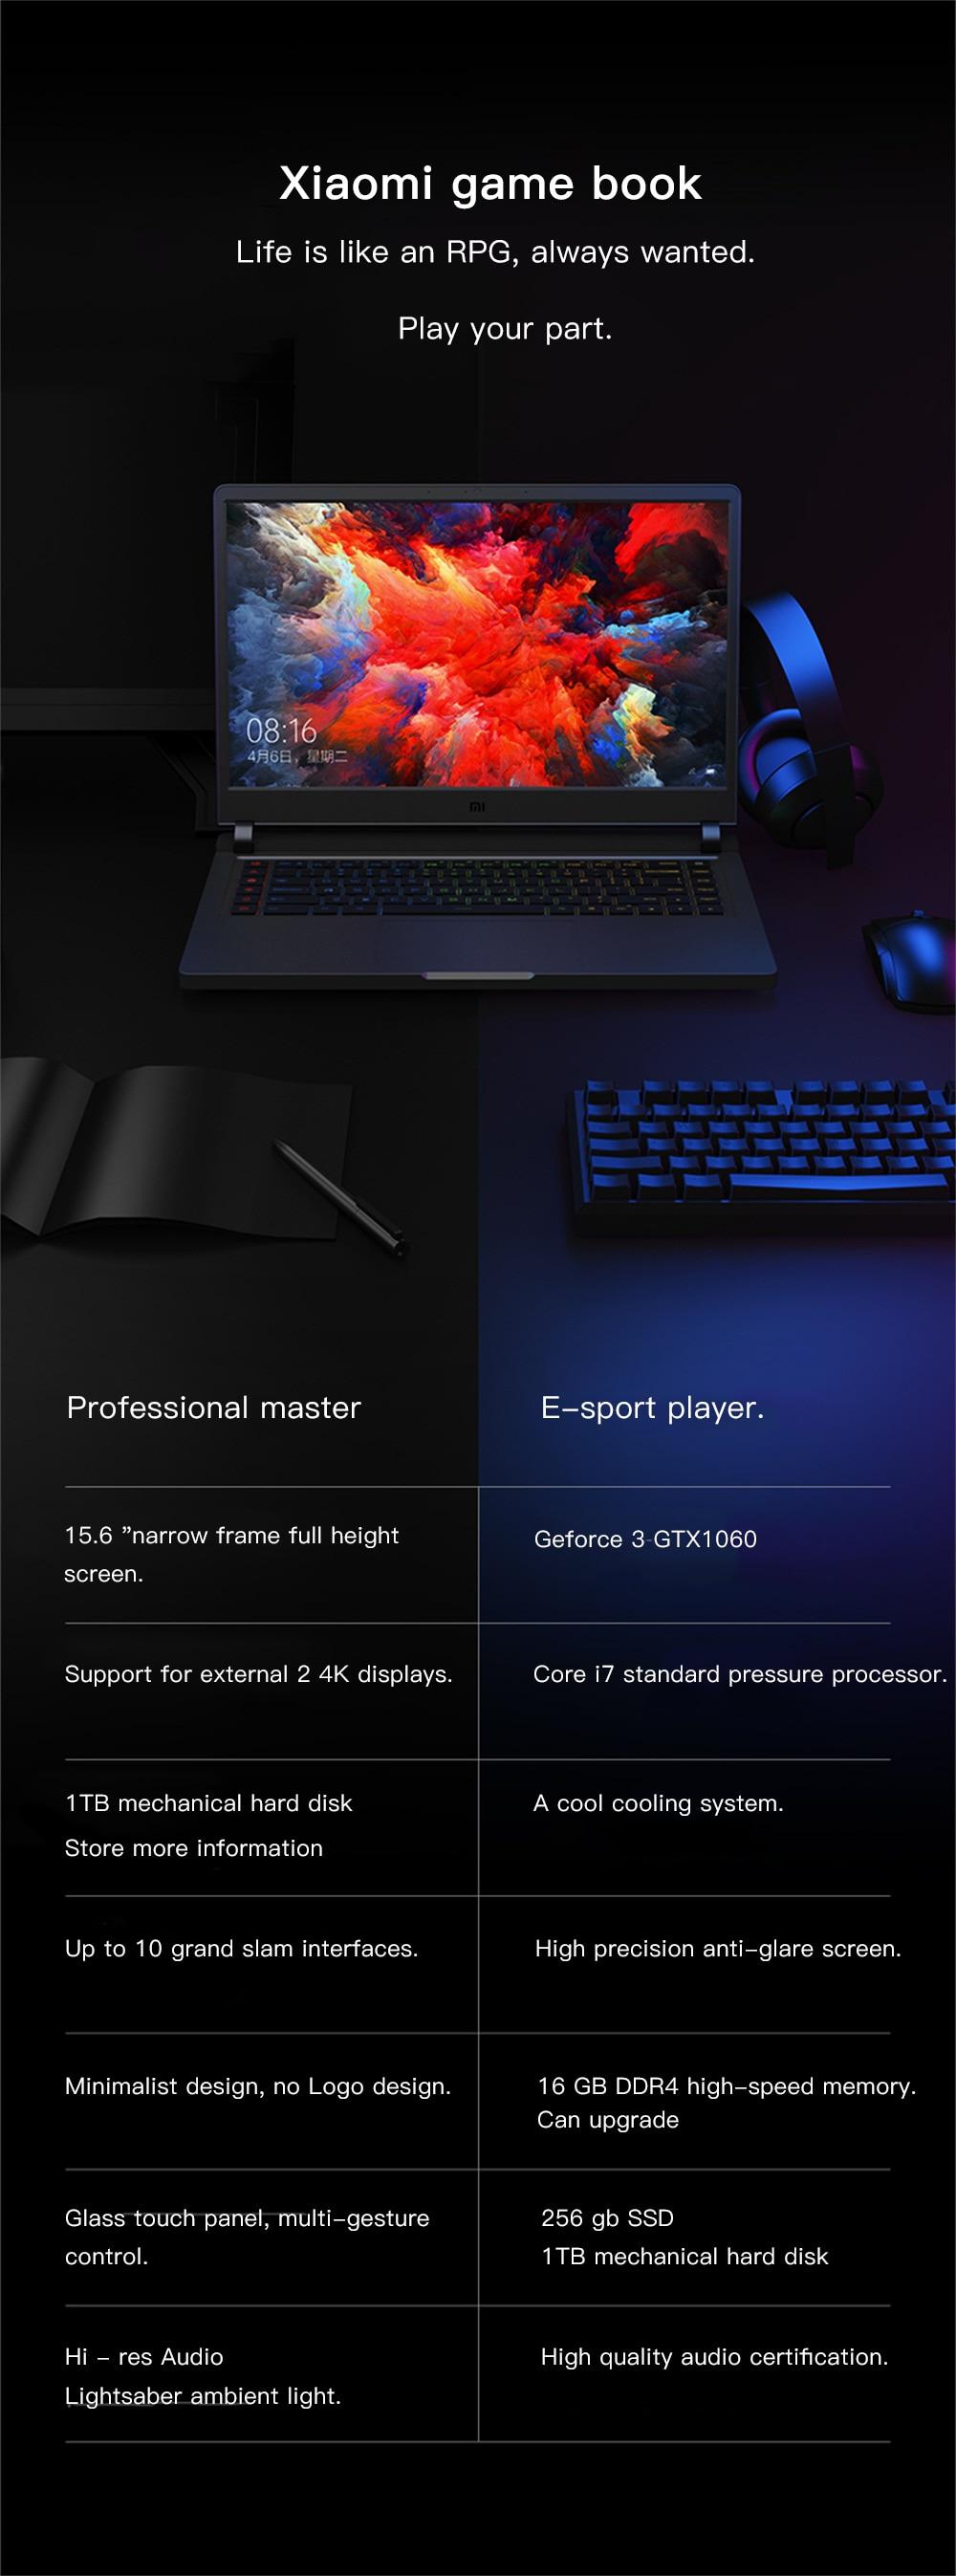 Xiaomi Mi Gaming Notebook 15.6 Intel Core 8G+1258G/16G 256GB Windows 10 Quad-core NVIDIA GeForce GTX 1060 I7-7700HQ 13